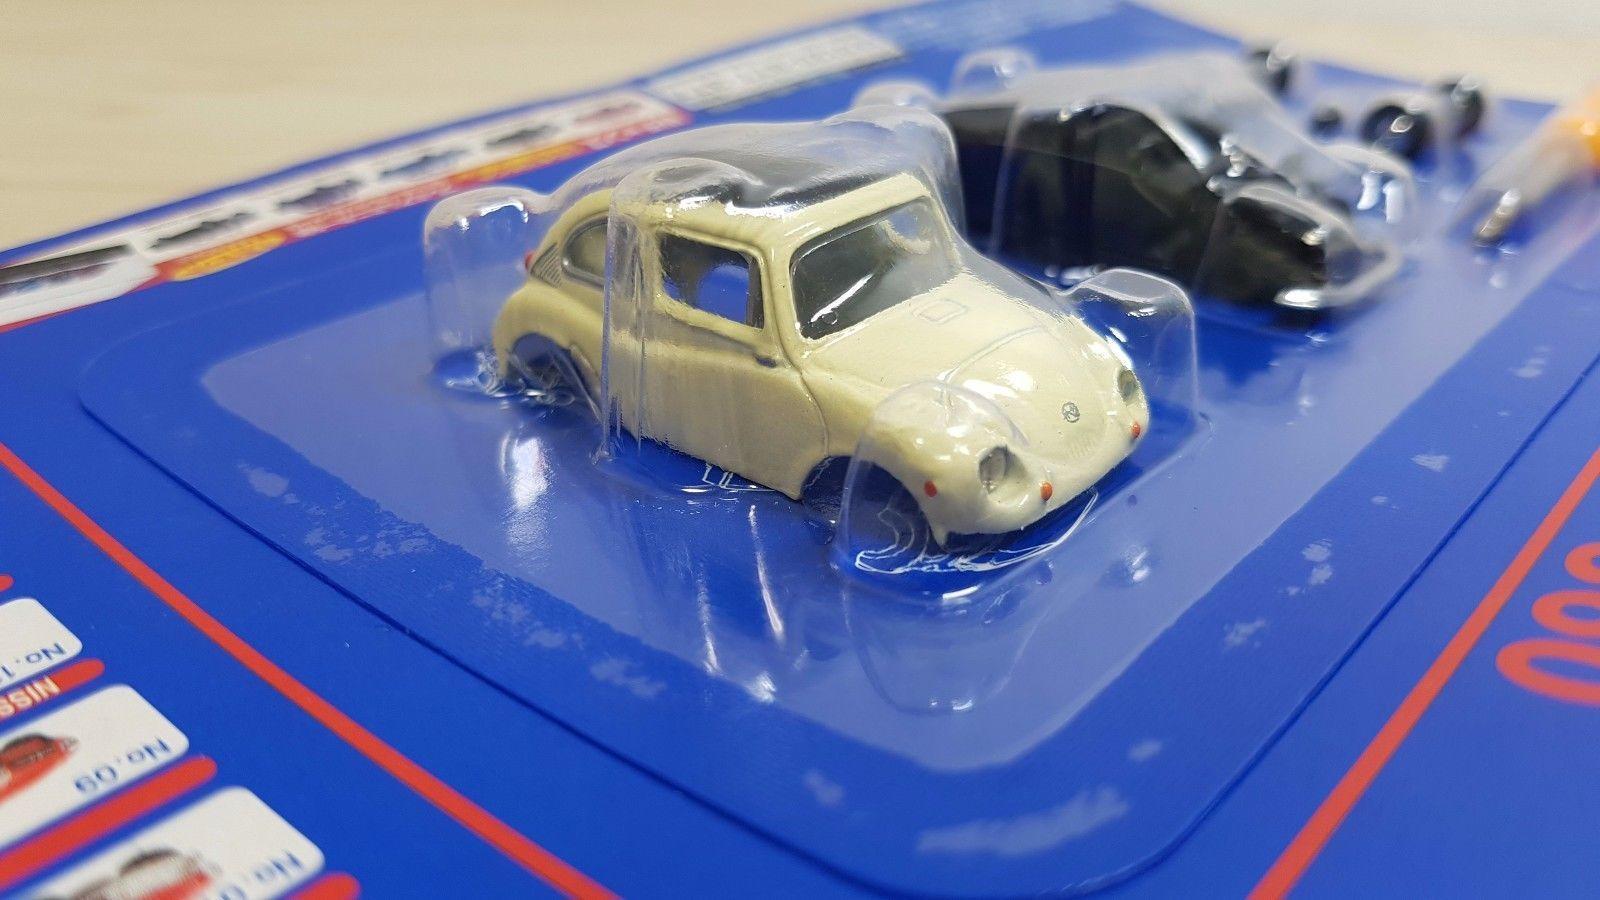 1/64 Konami Dydo SUBARU 360 IVORY diecast car model kit NEW